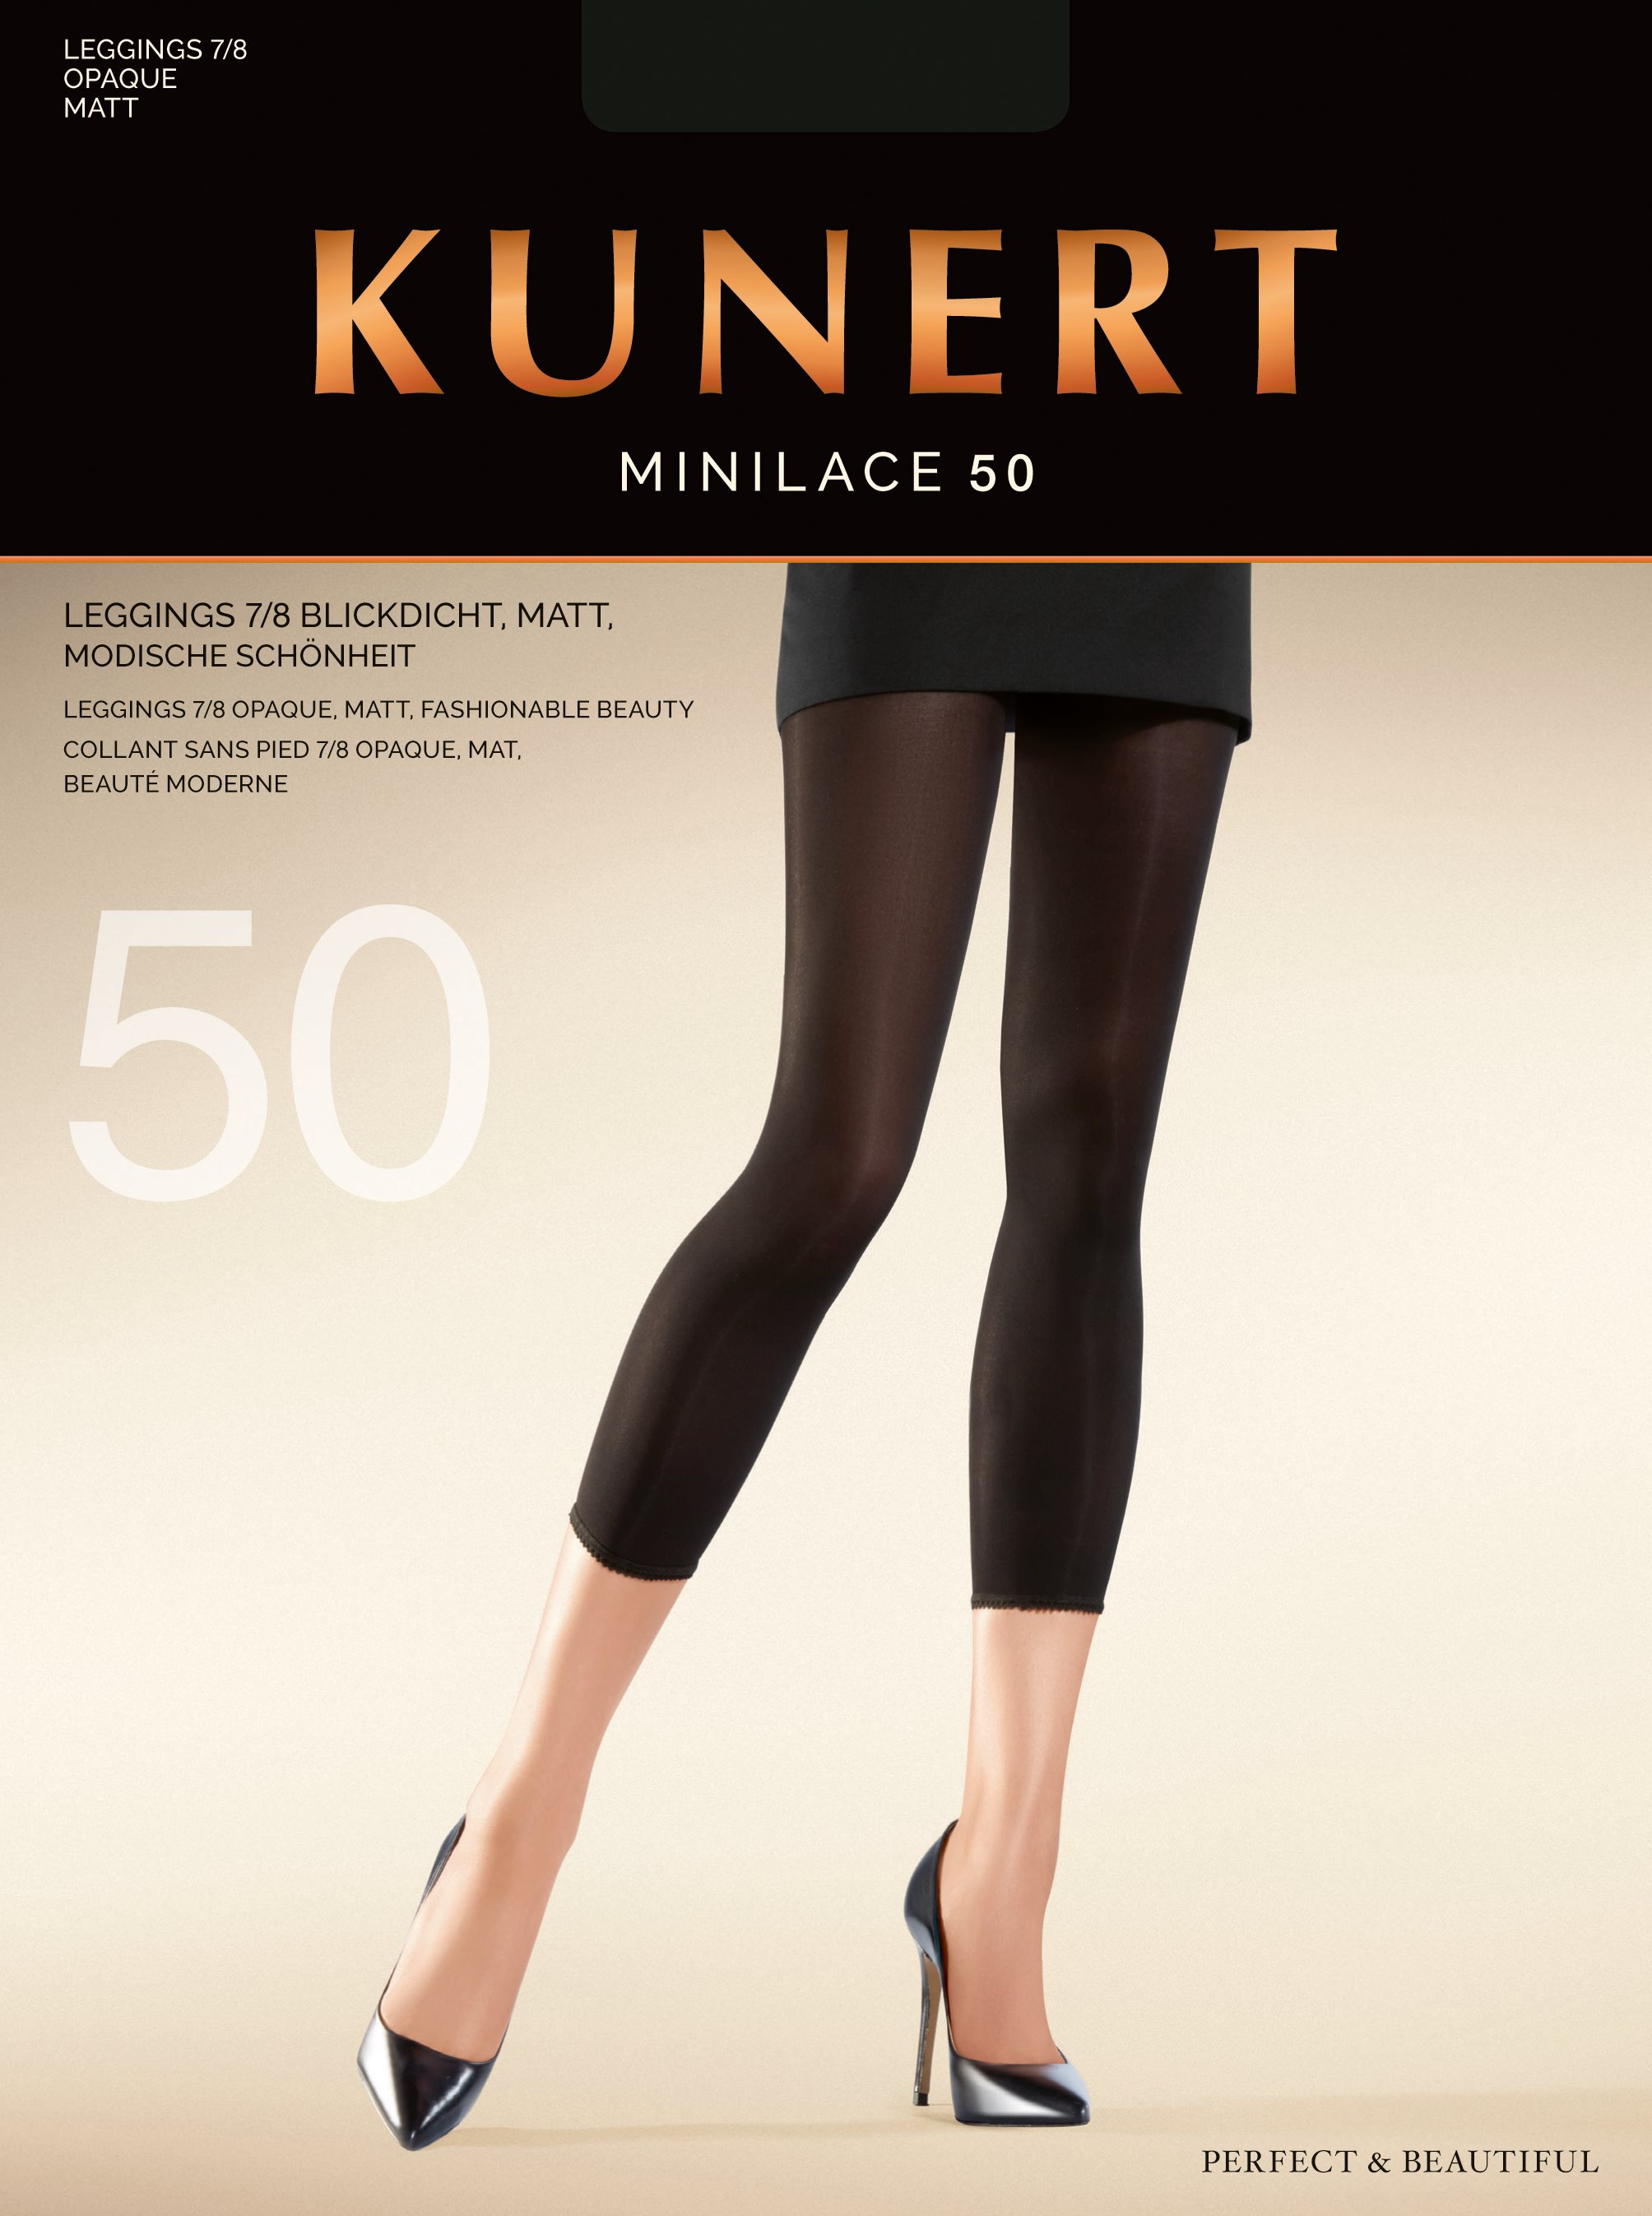 capri leggings kunert leggins mit einem dezenten. Black Bedroom Furniture Sets. Home Design Ideas